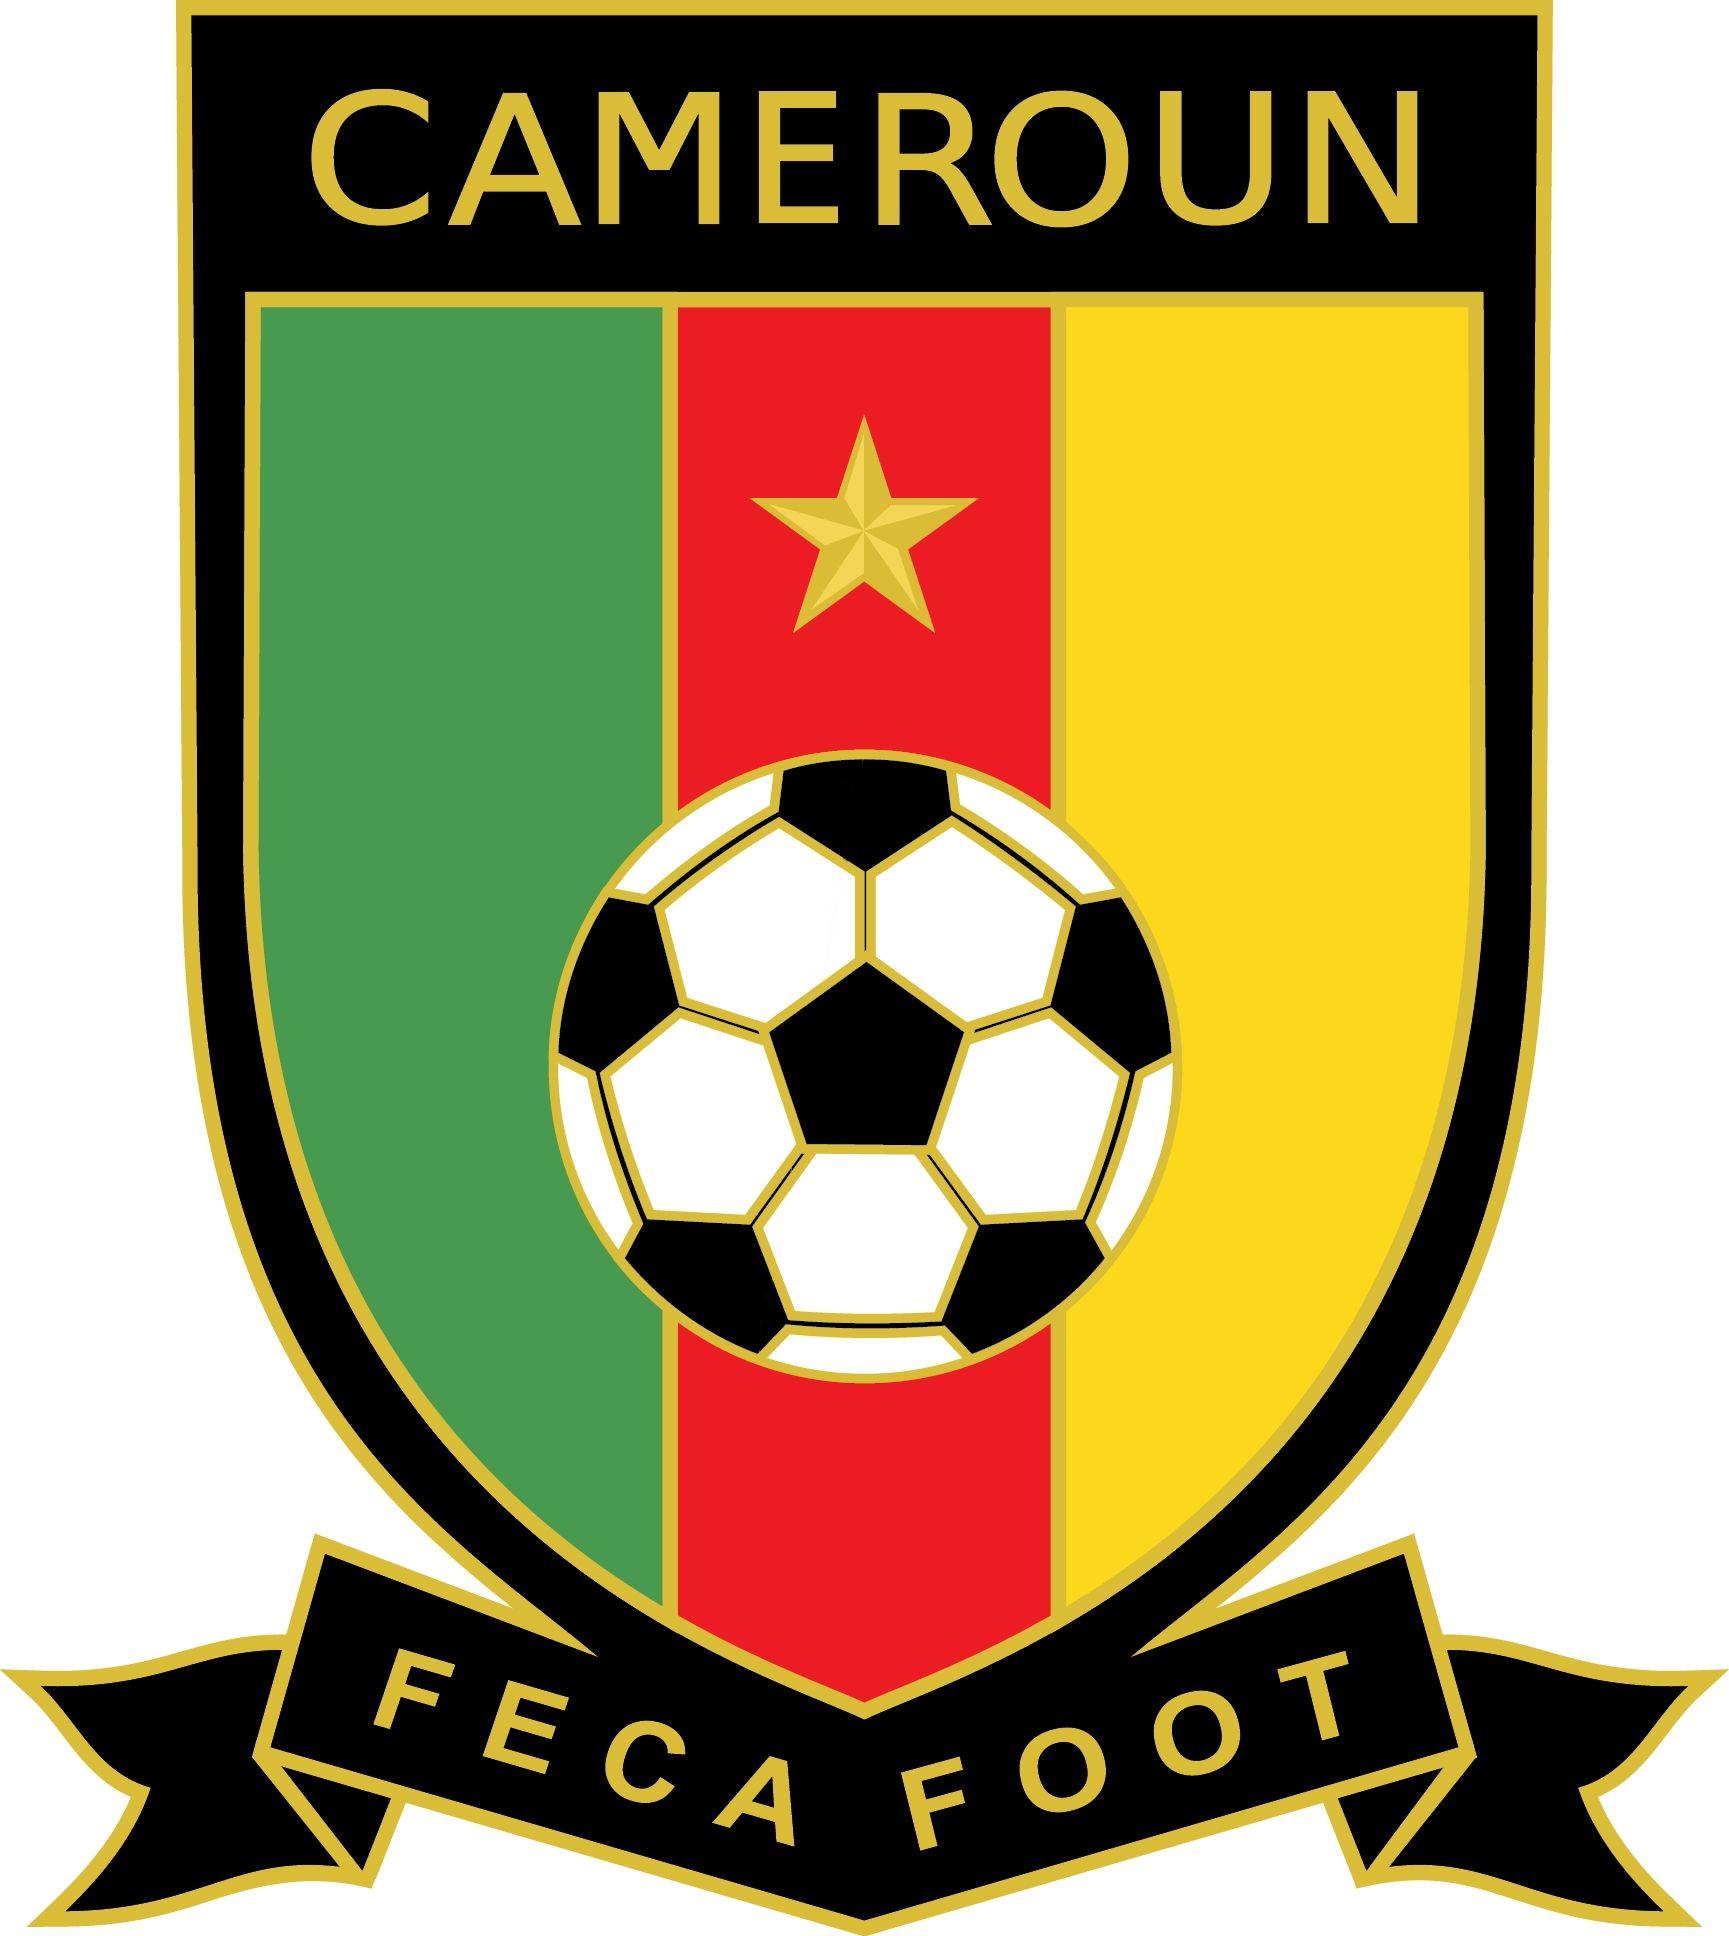 Federation camerounaise de football cameroon national